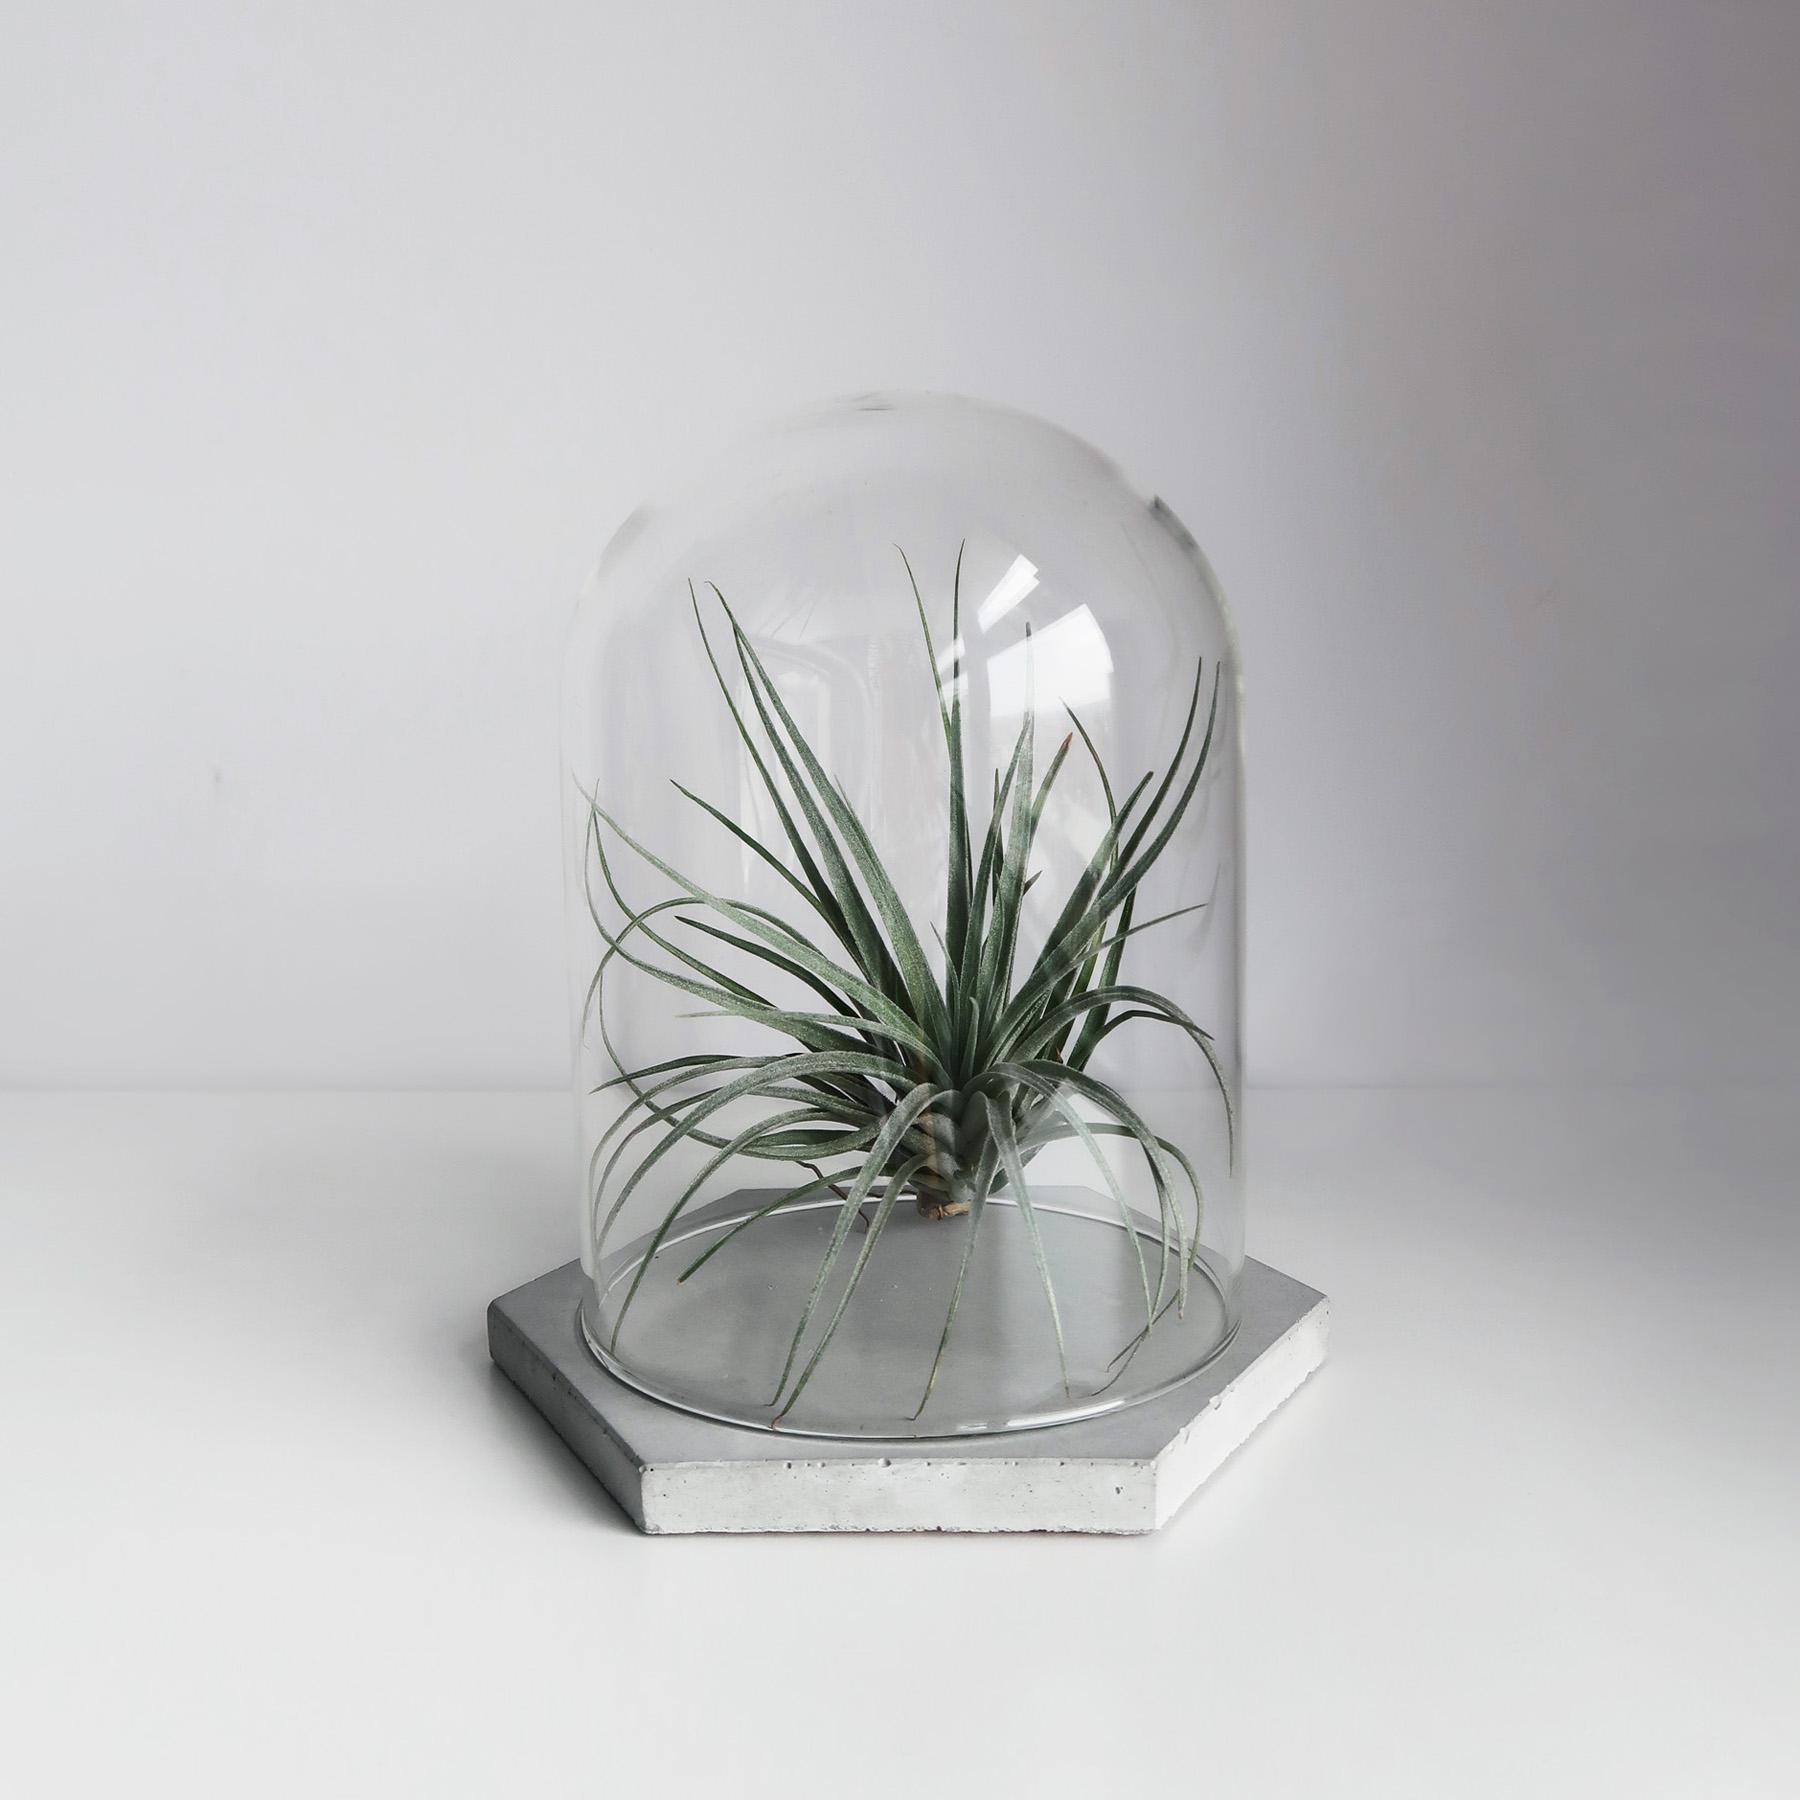 GLASS HOUSE 玻璃屋六角水泥飾盤玻璃鐘罩 / Concrete Hexagonal tray with bell jar, Jewelry dish